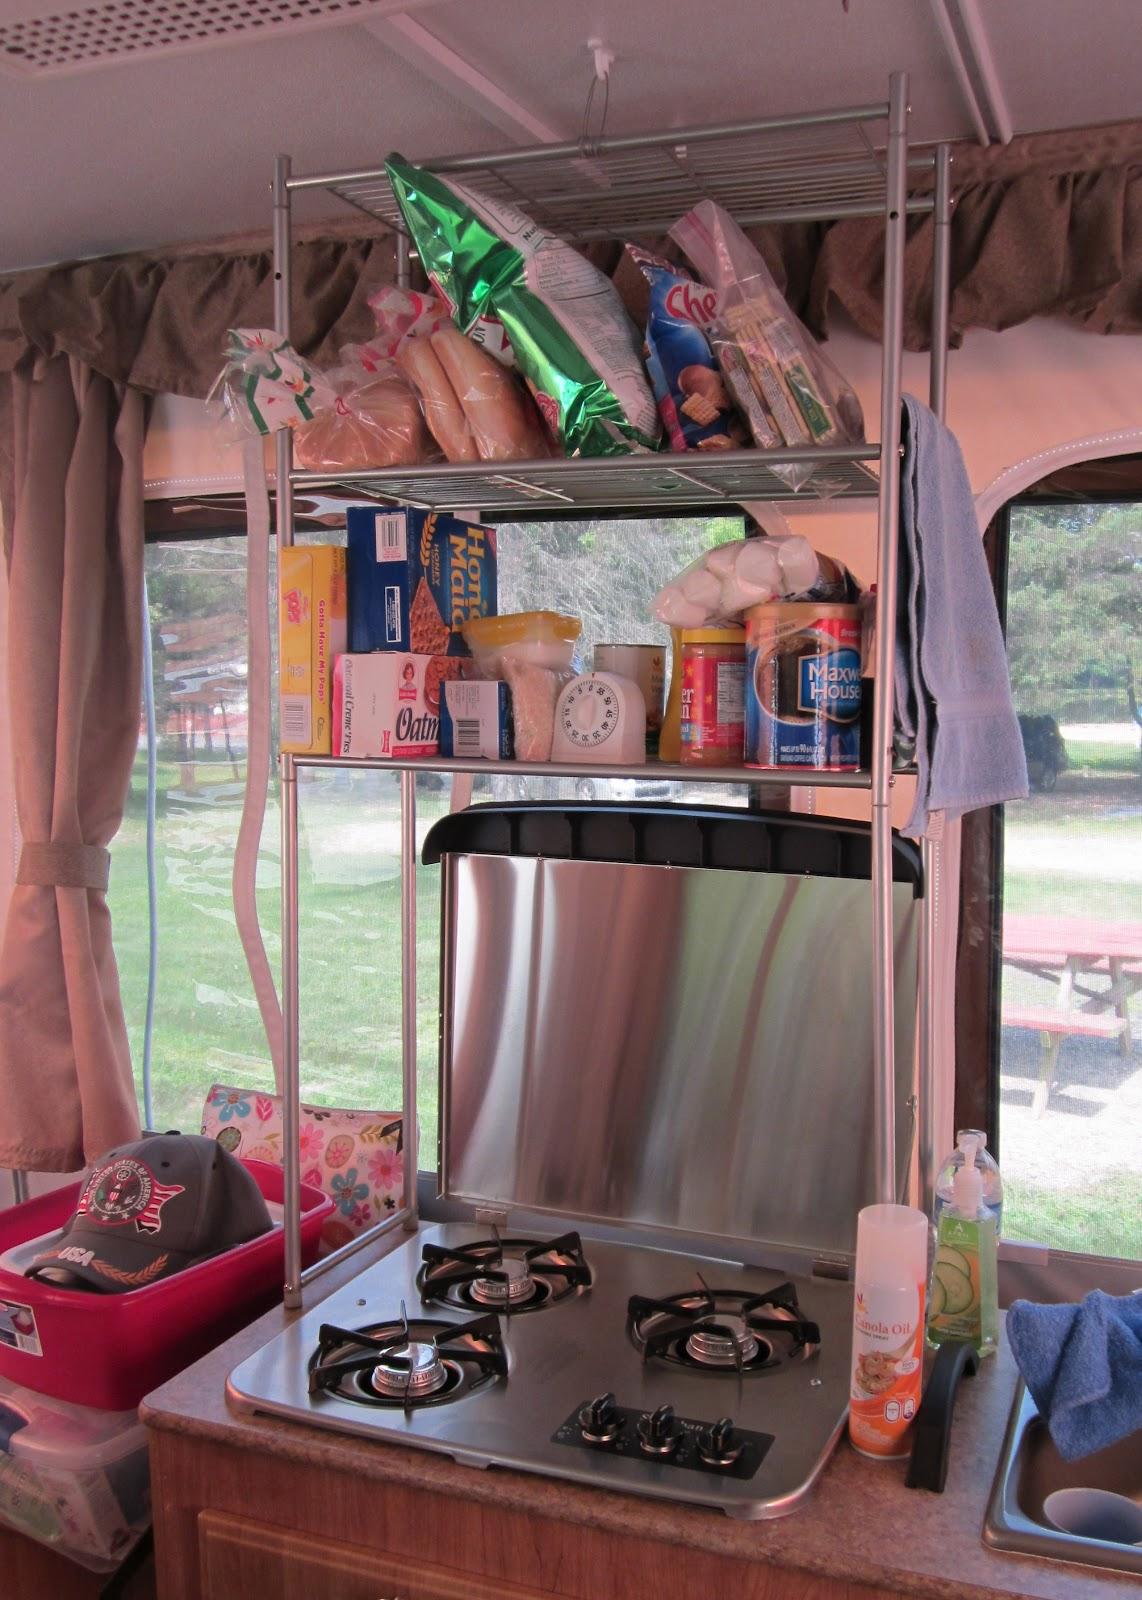 The Schaffer's RV Trip Log: August 2012